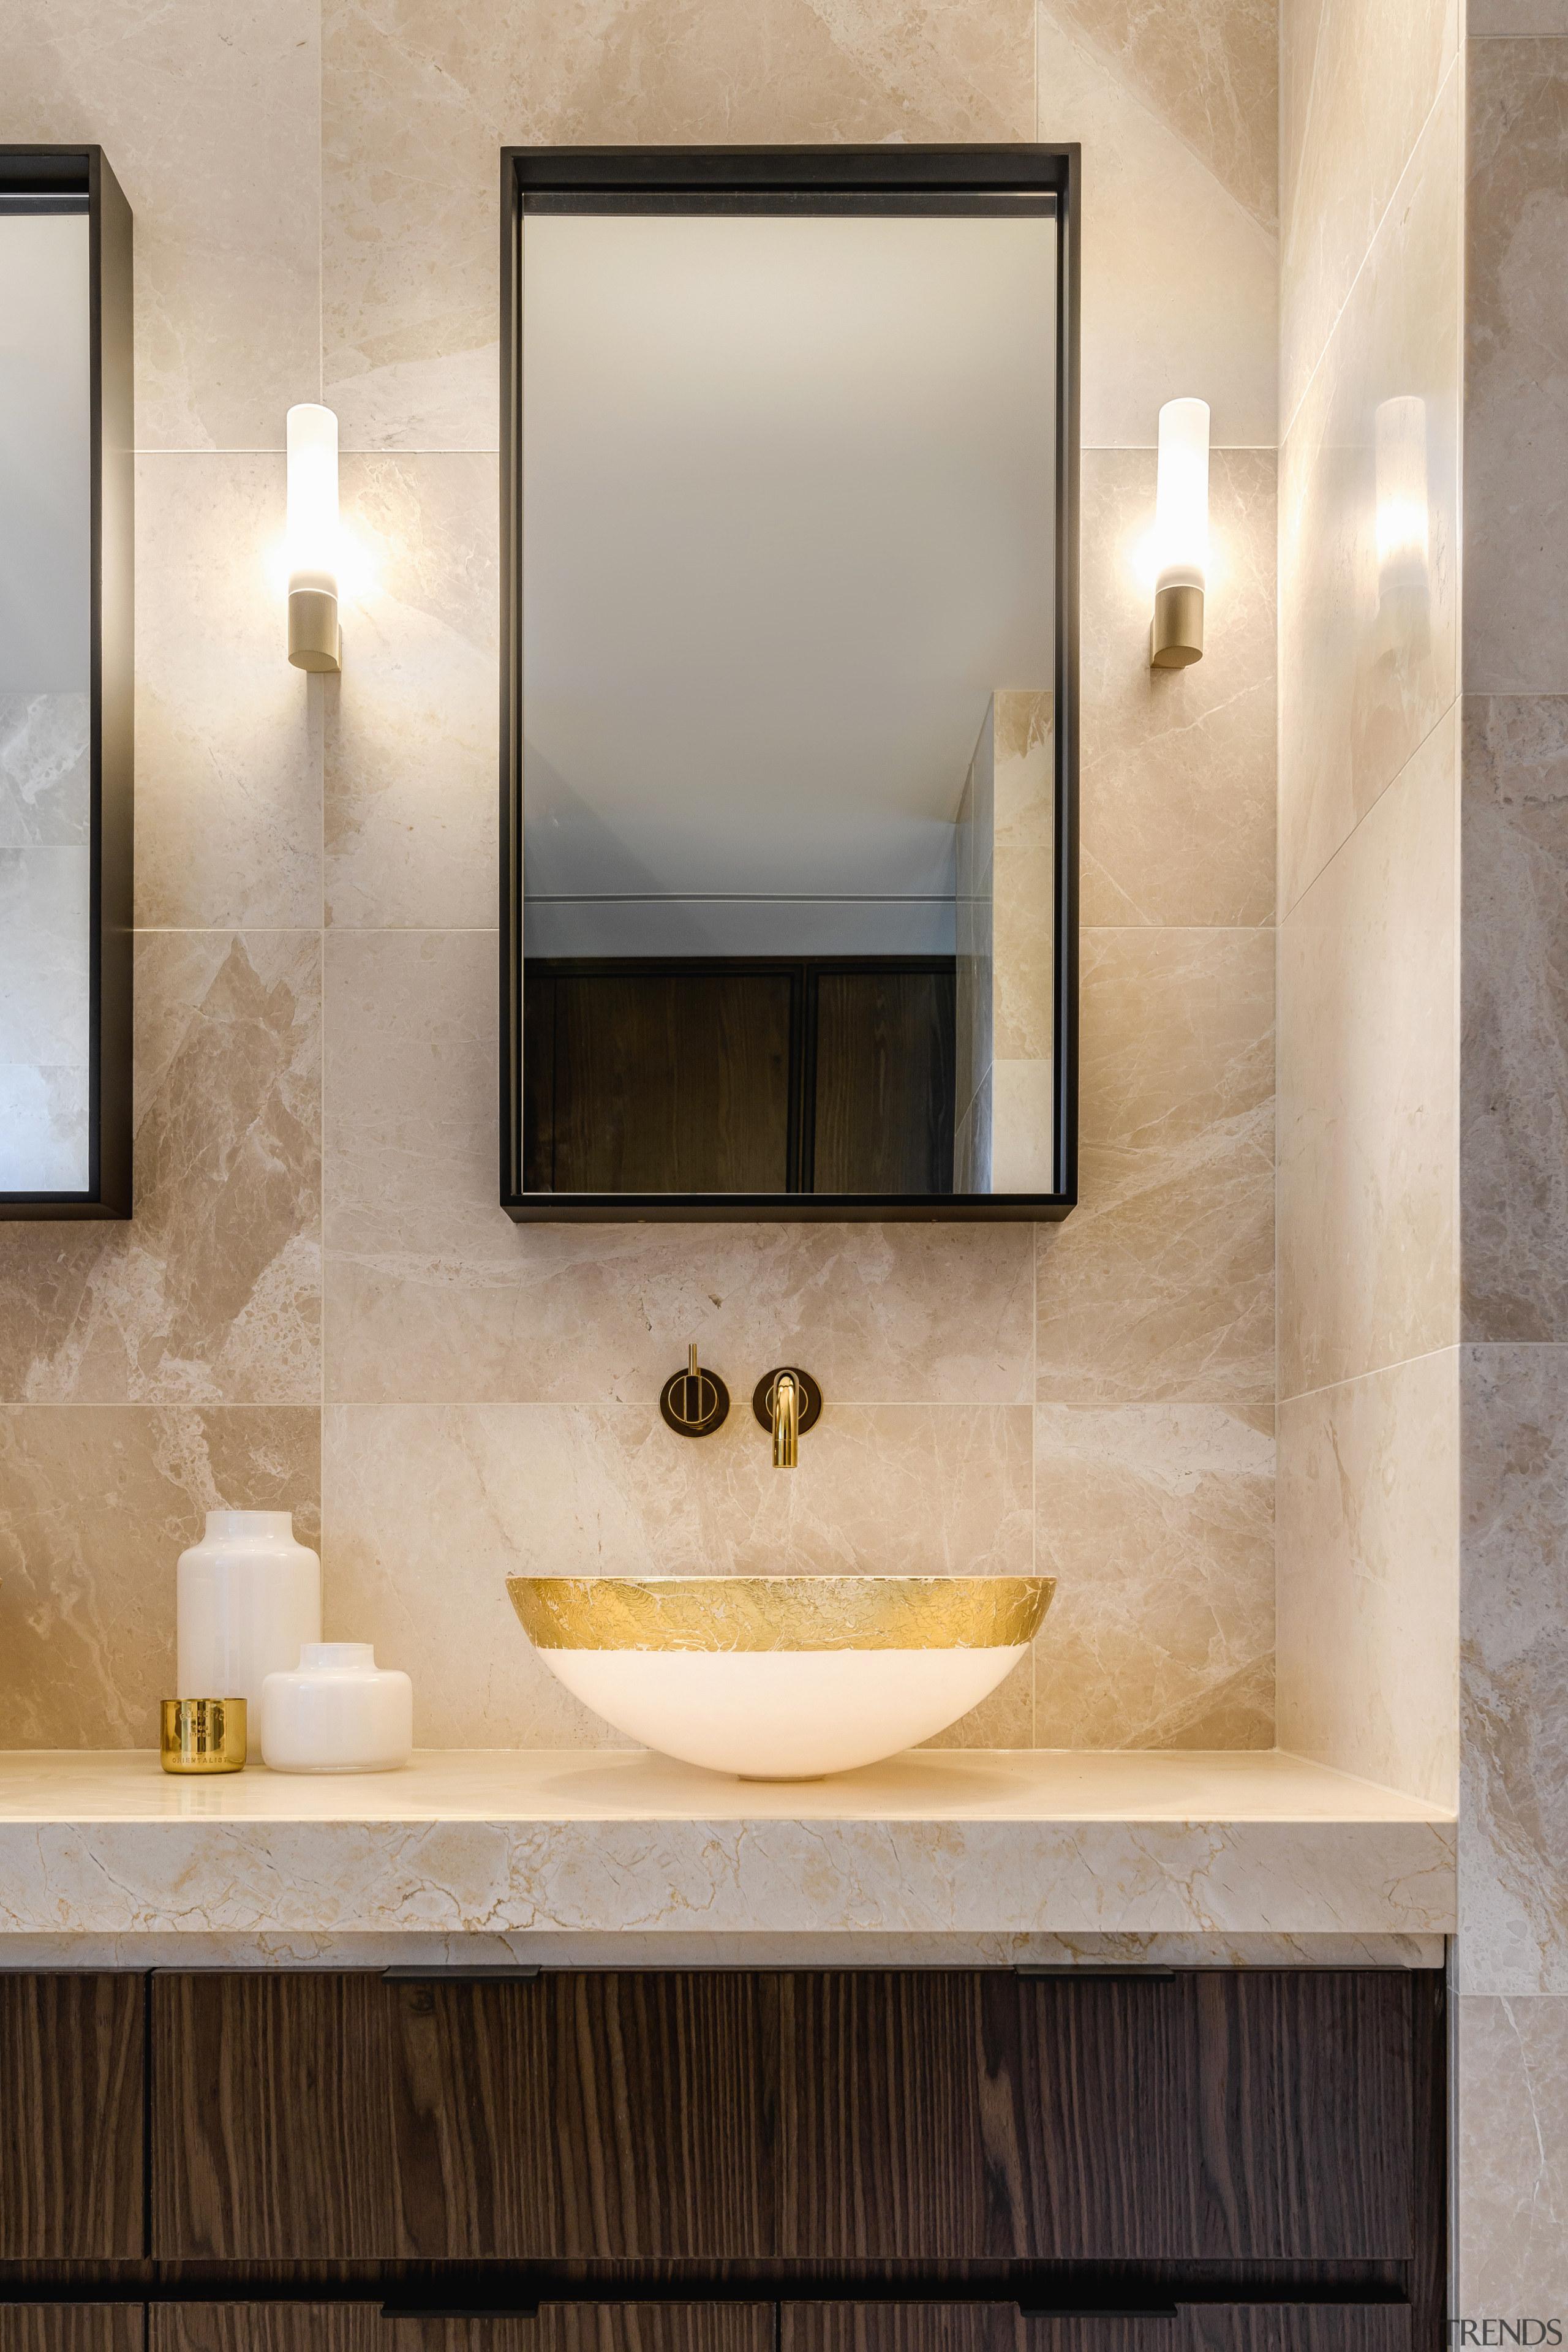 Custom steel-framed mirror wall cabinets provide additional storage architecture, bathroom, bathroom accessory, bathroom cabinet, bathroom sink, floor, interior design, marble, plumbing fixture, Davinia Sutton, mirror, wall cabinets